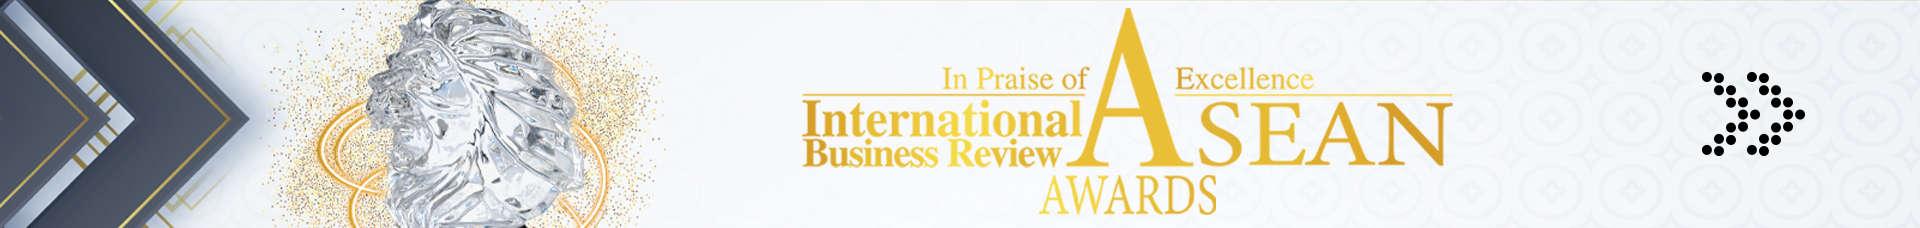 International Business Review ASEAN Awards Banner